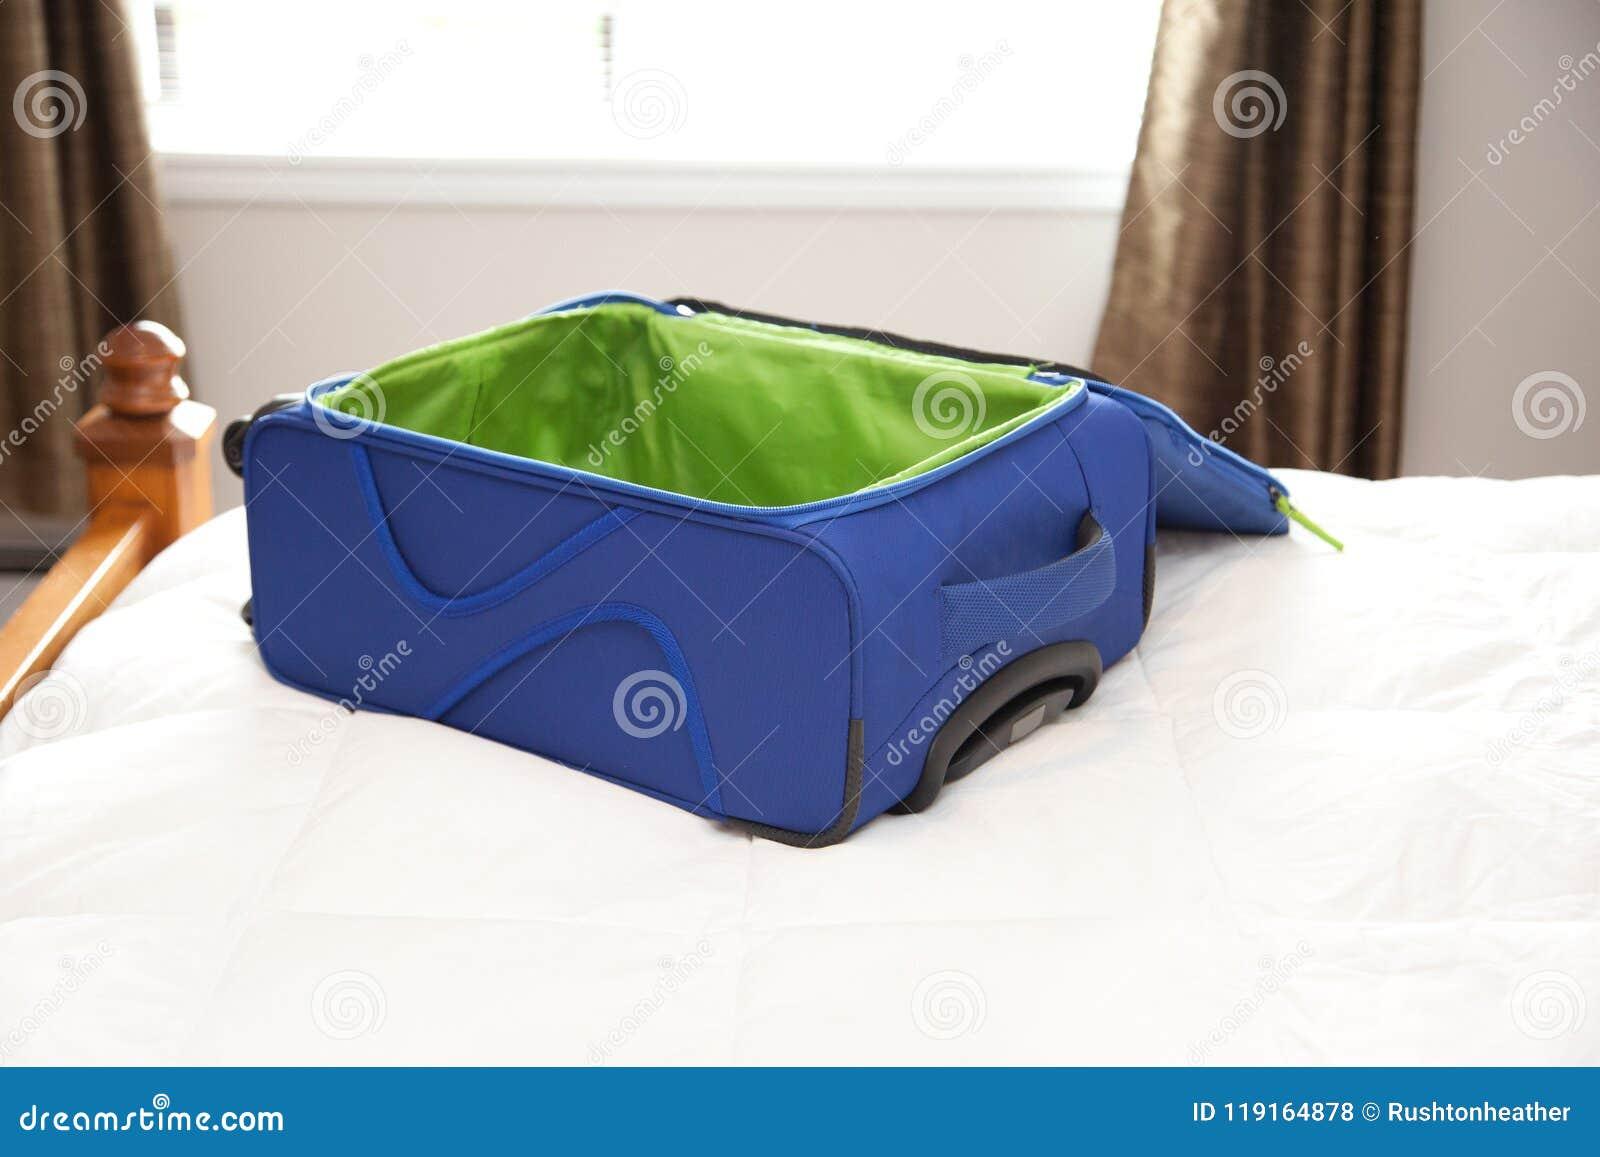 Пустой чемодан на кровати